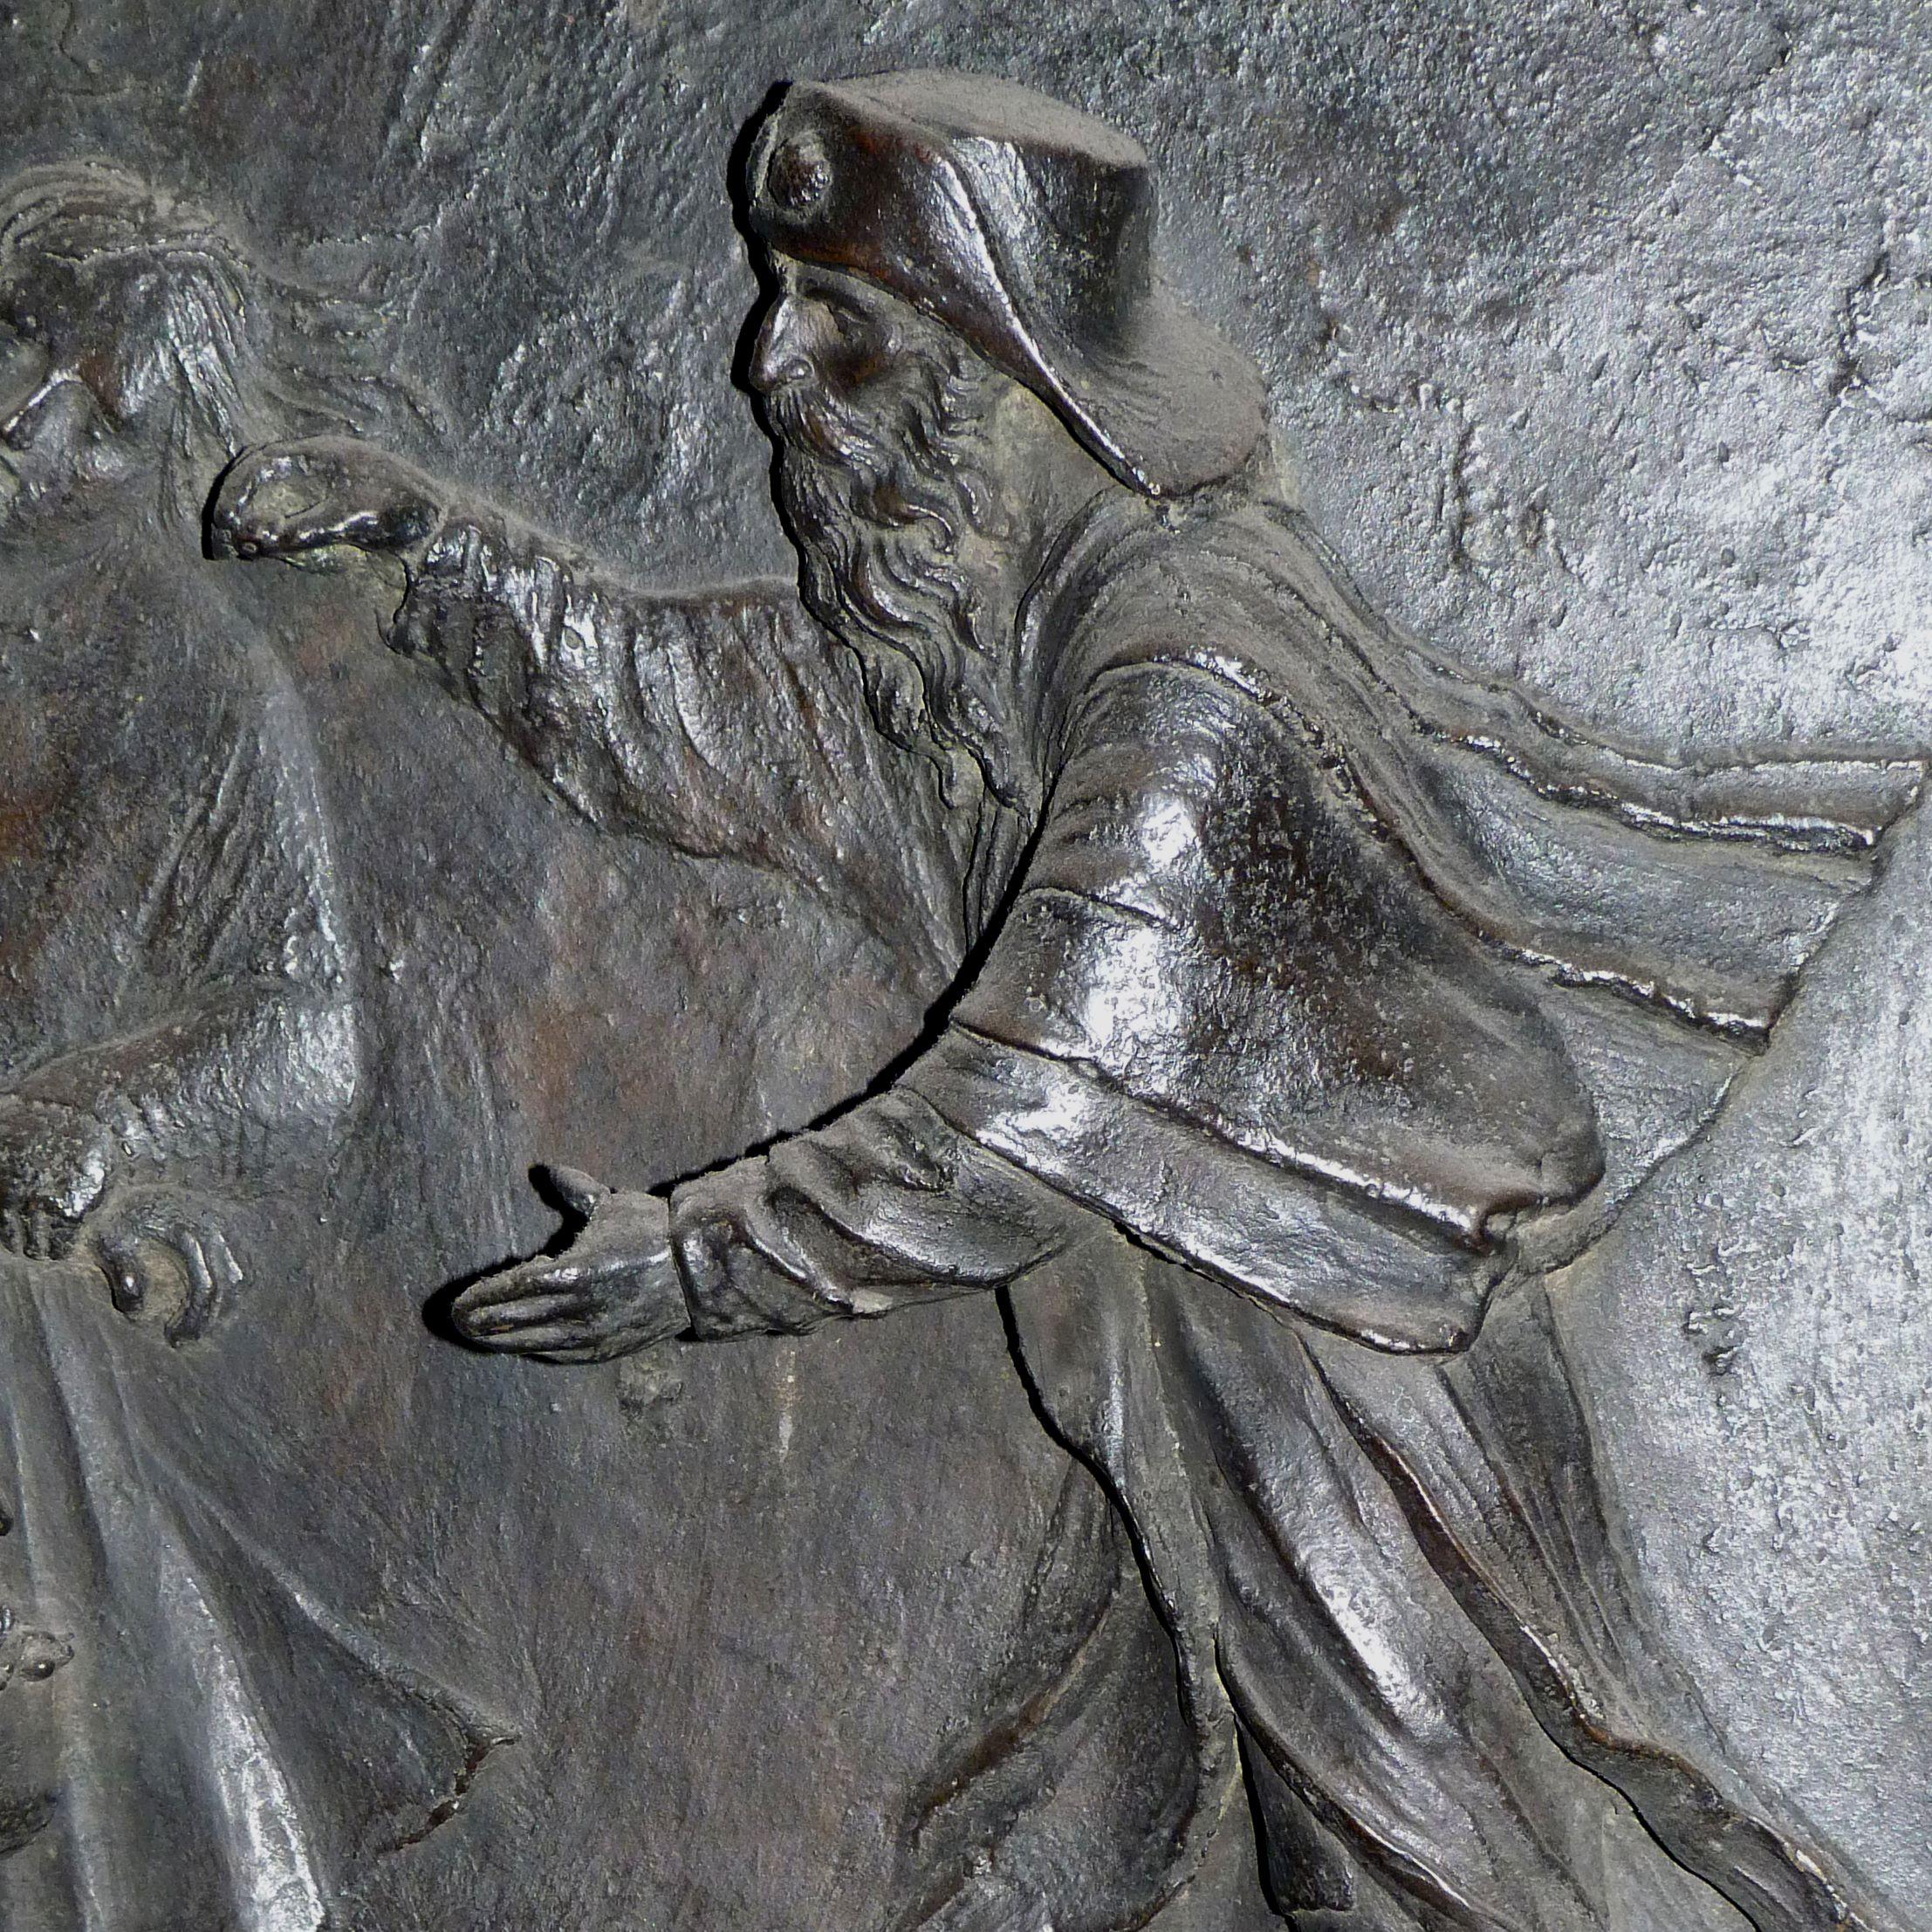 Sebaldusgrab (Nordseite) Sebalduslegedne, Heilung des Blinden, Detail des Sebaldus